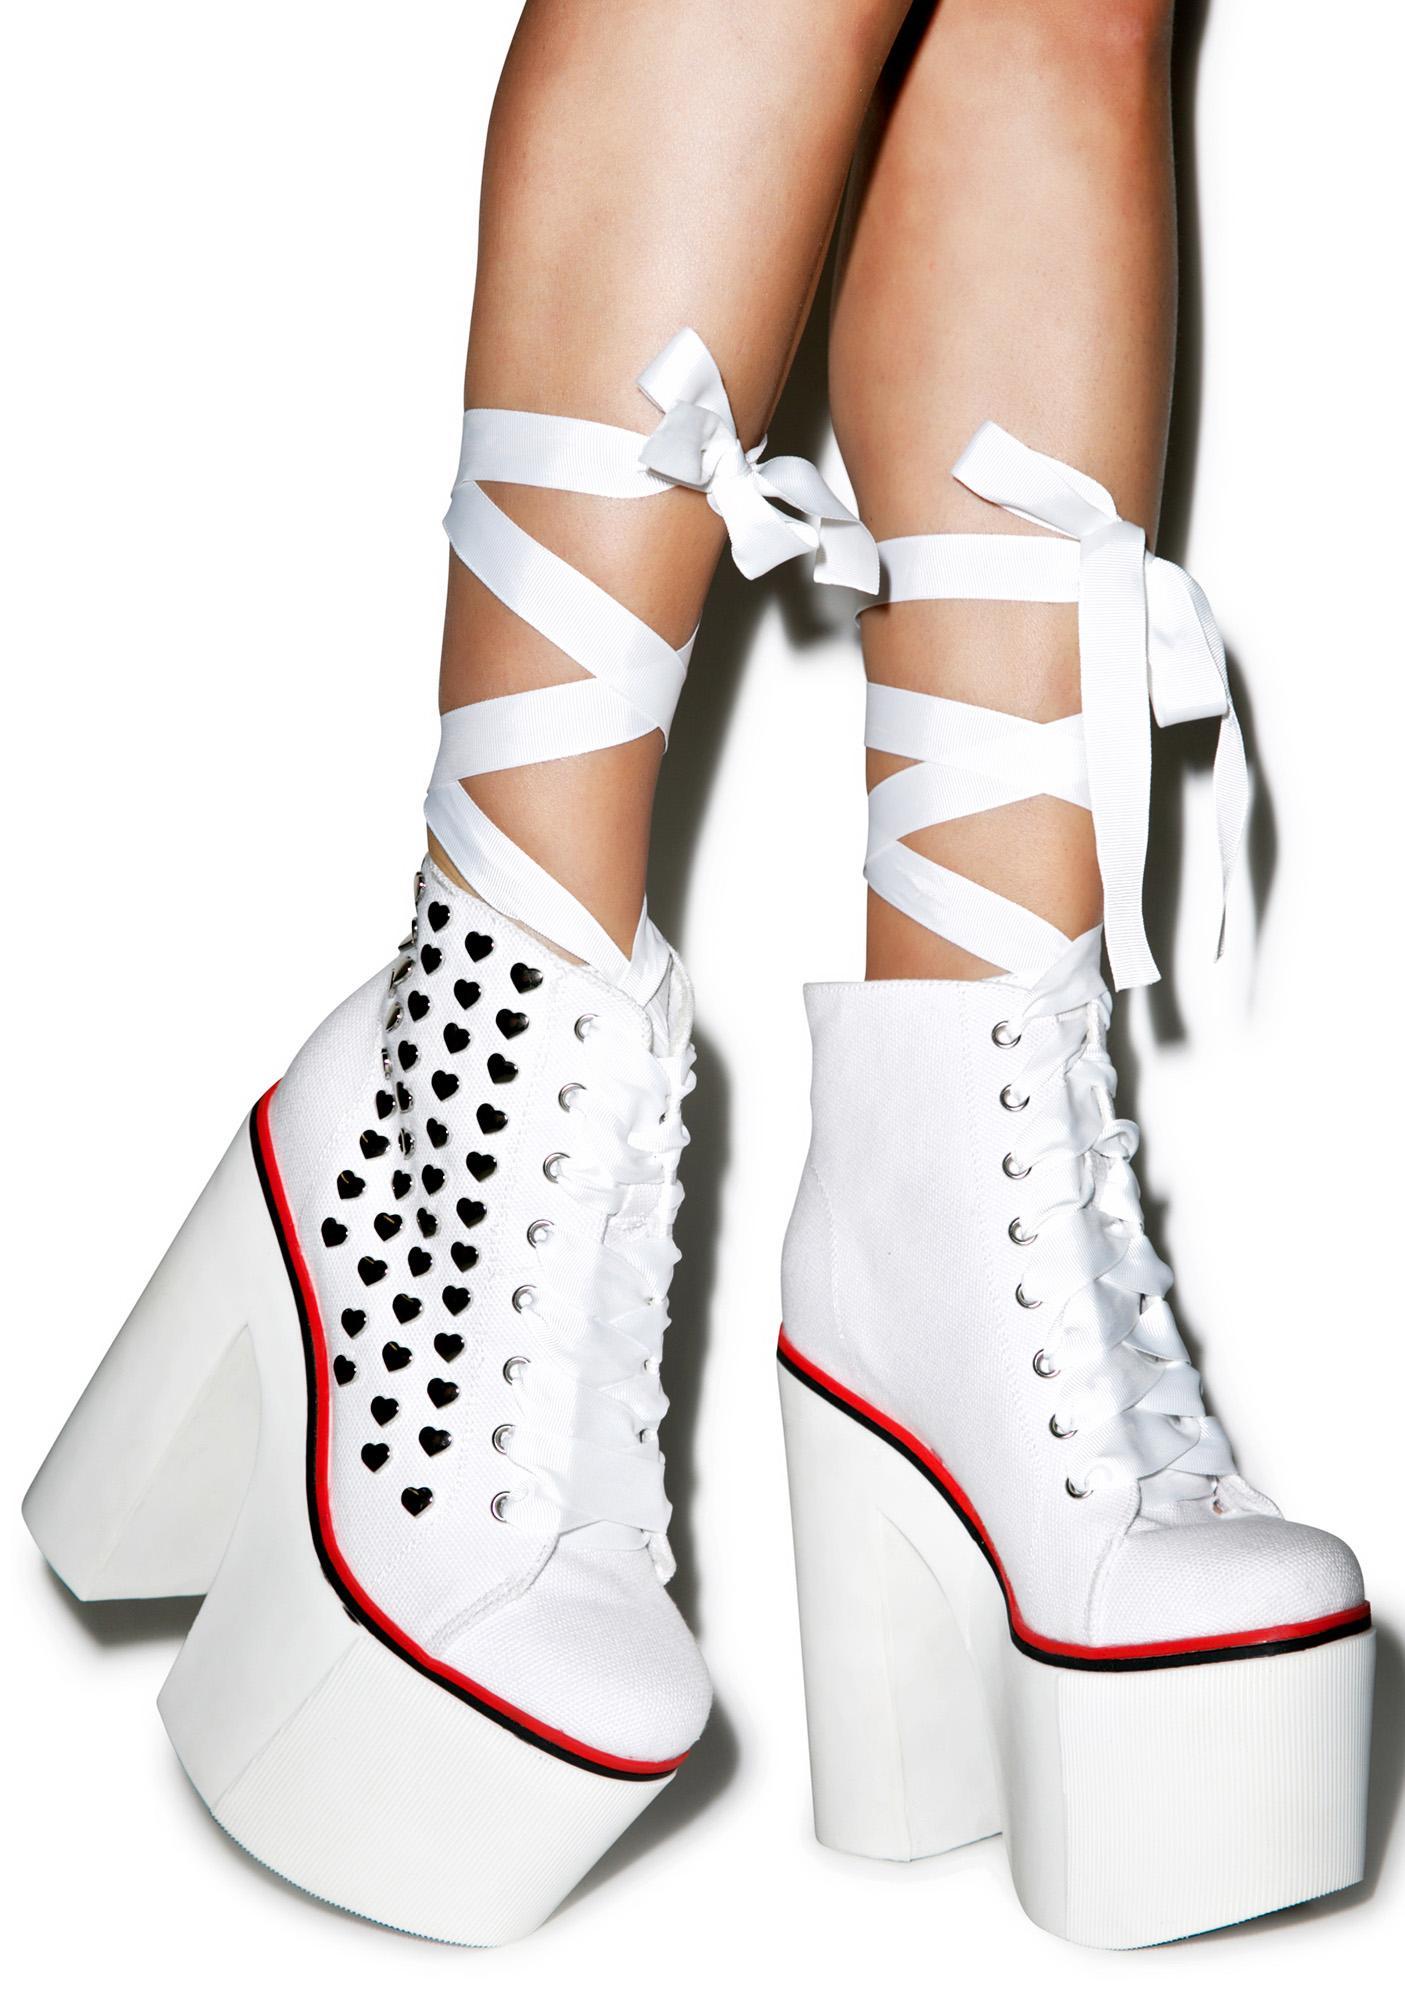 Sugar Thrillz Innocent Sweet Street Platform Sneakers